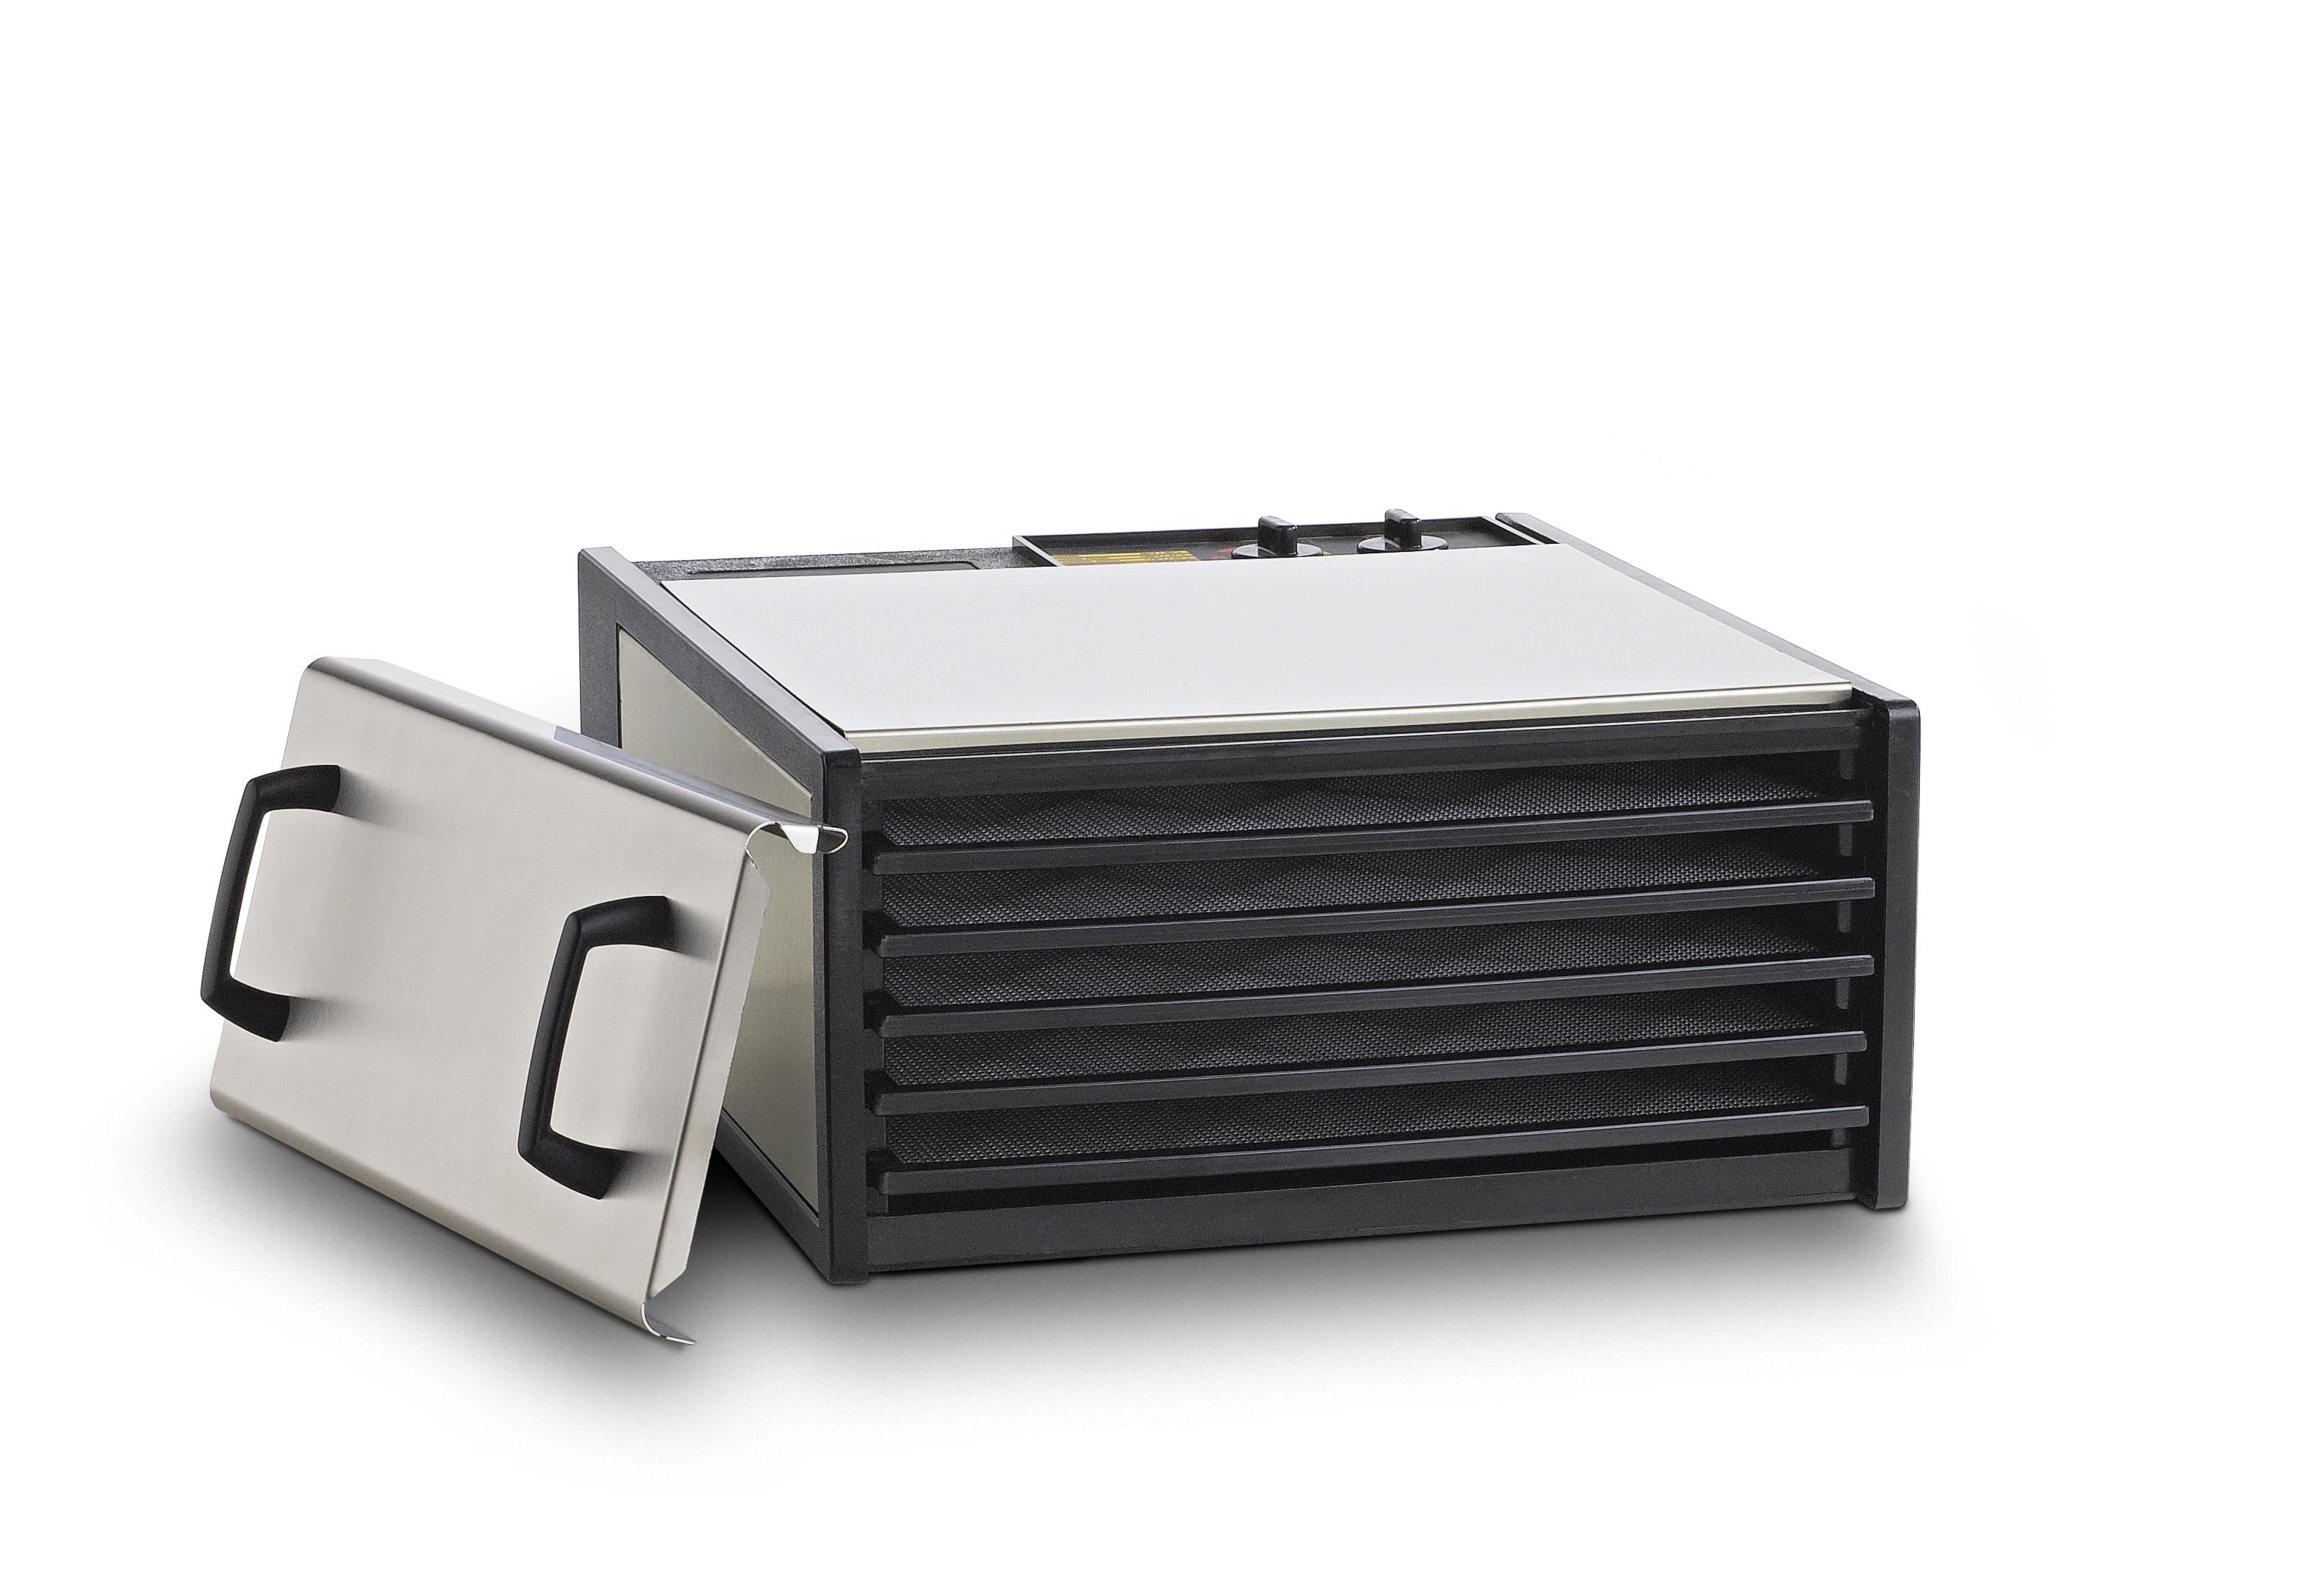 5 Tray Excalibur Food Dehydrator D500S